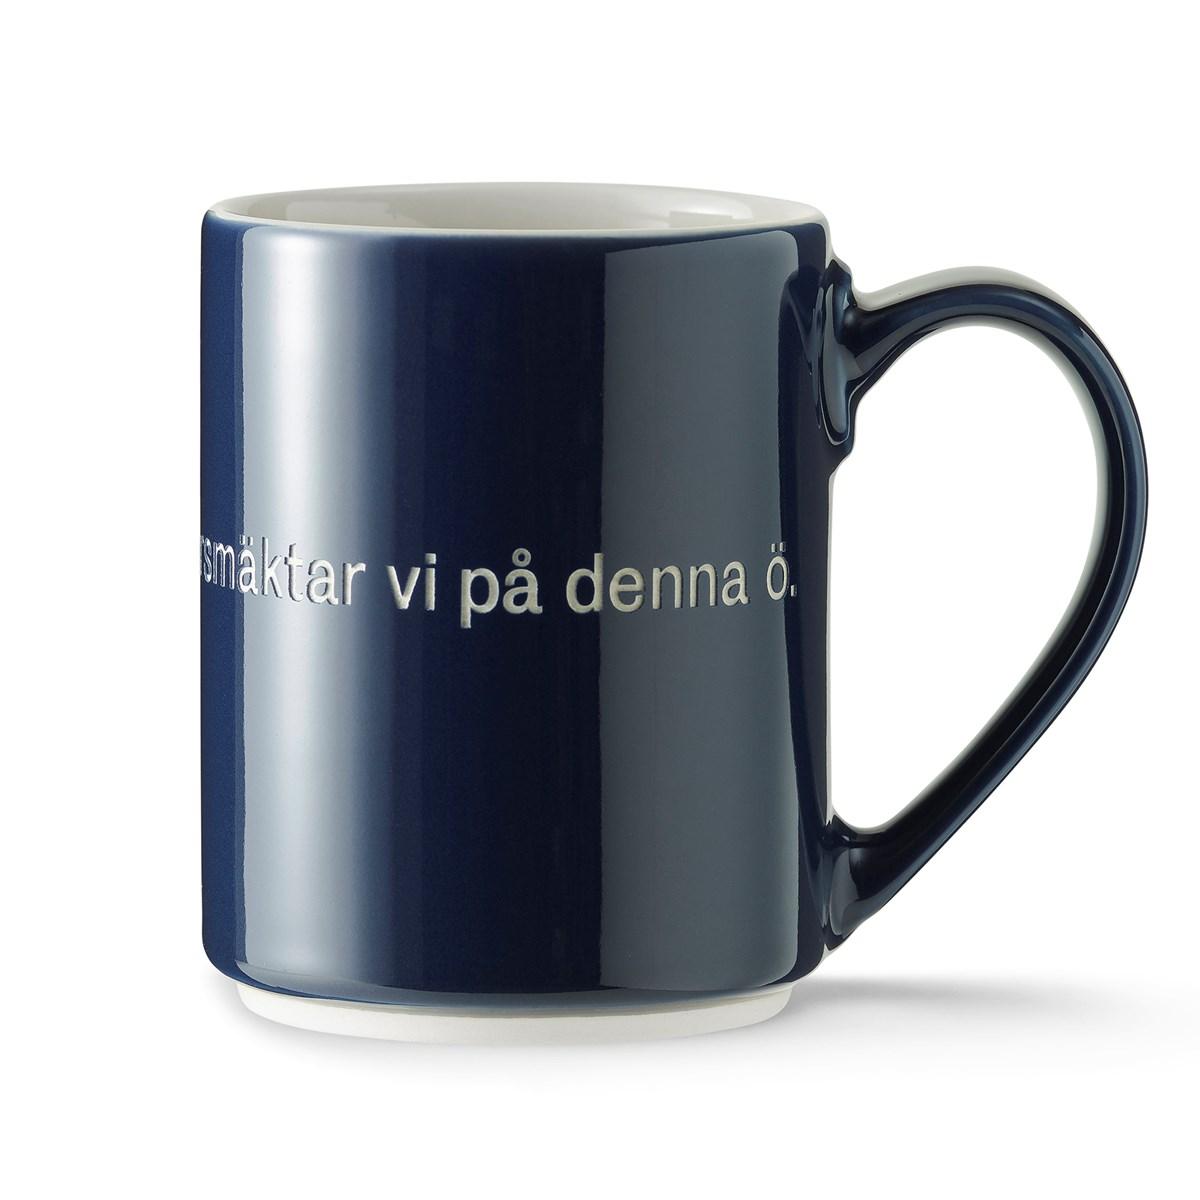 DHS Astrid Lindgren Krus